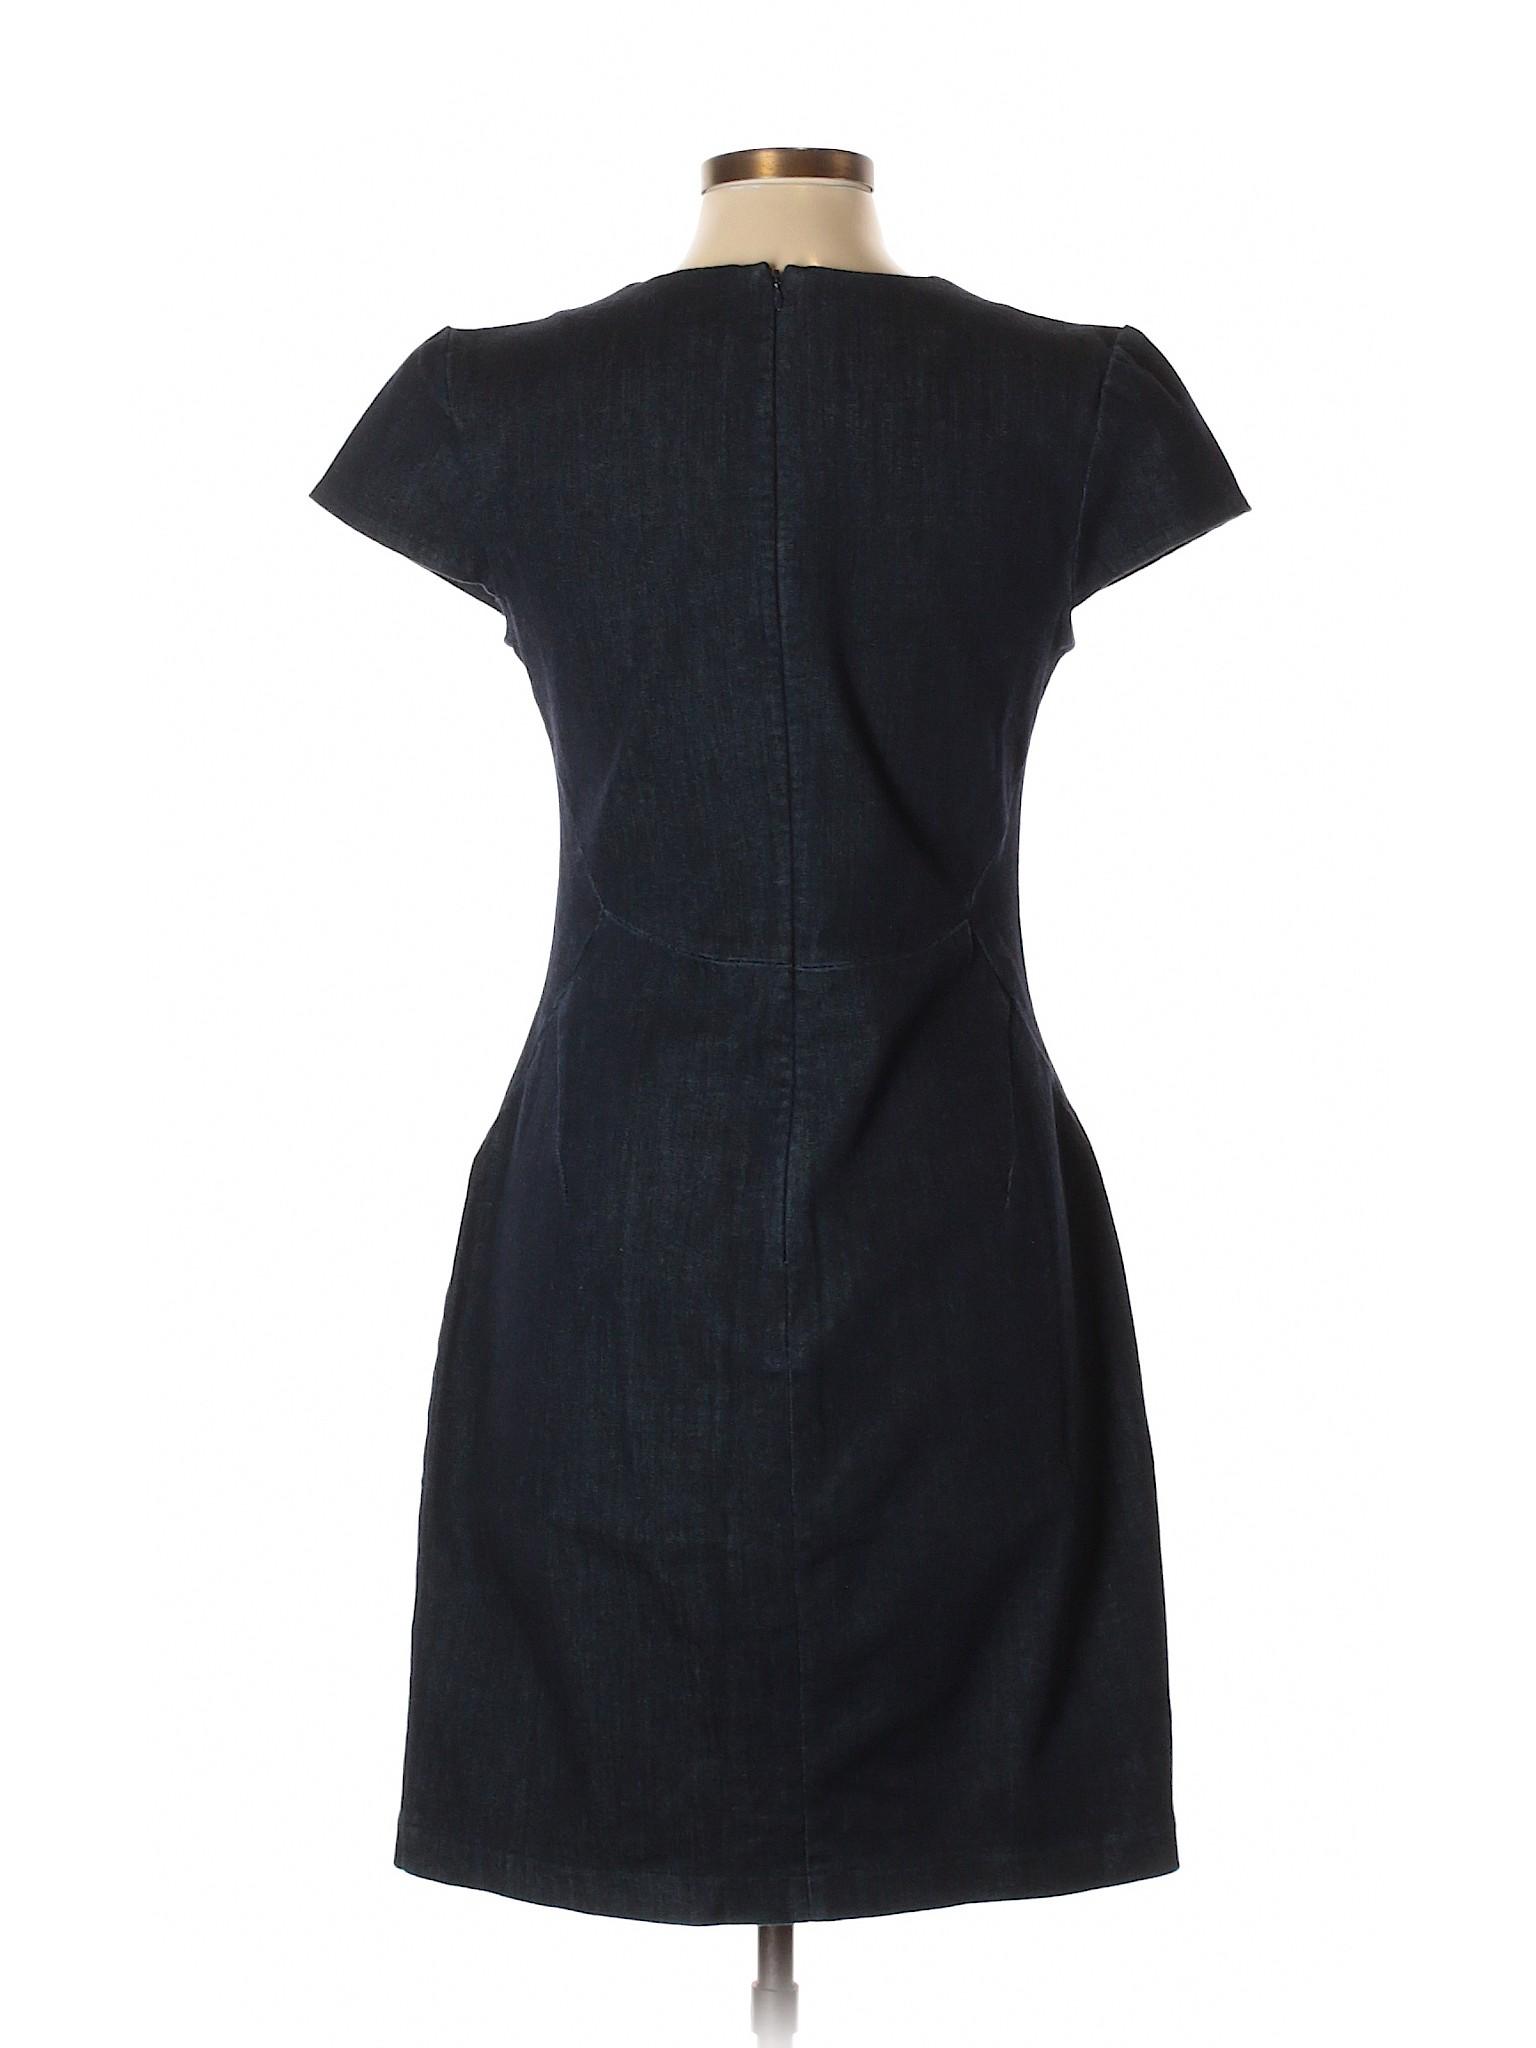 Casual winter Republic Dress Banana Boutique SYq7t4n7